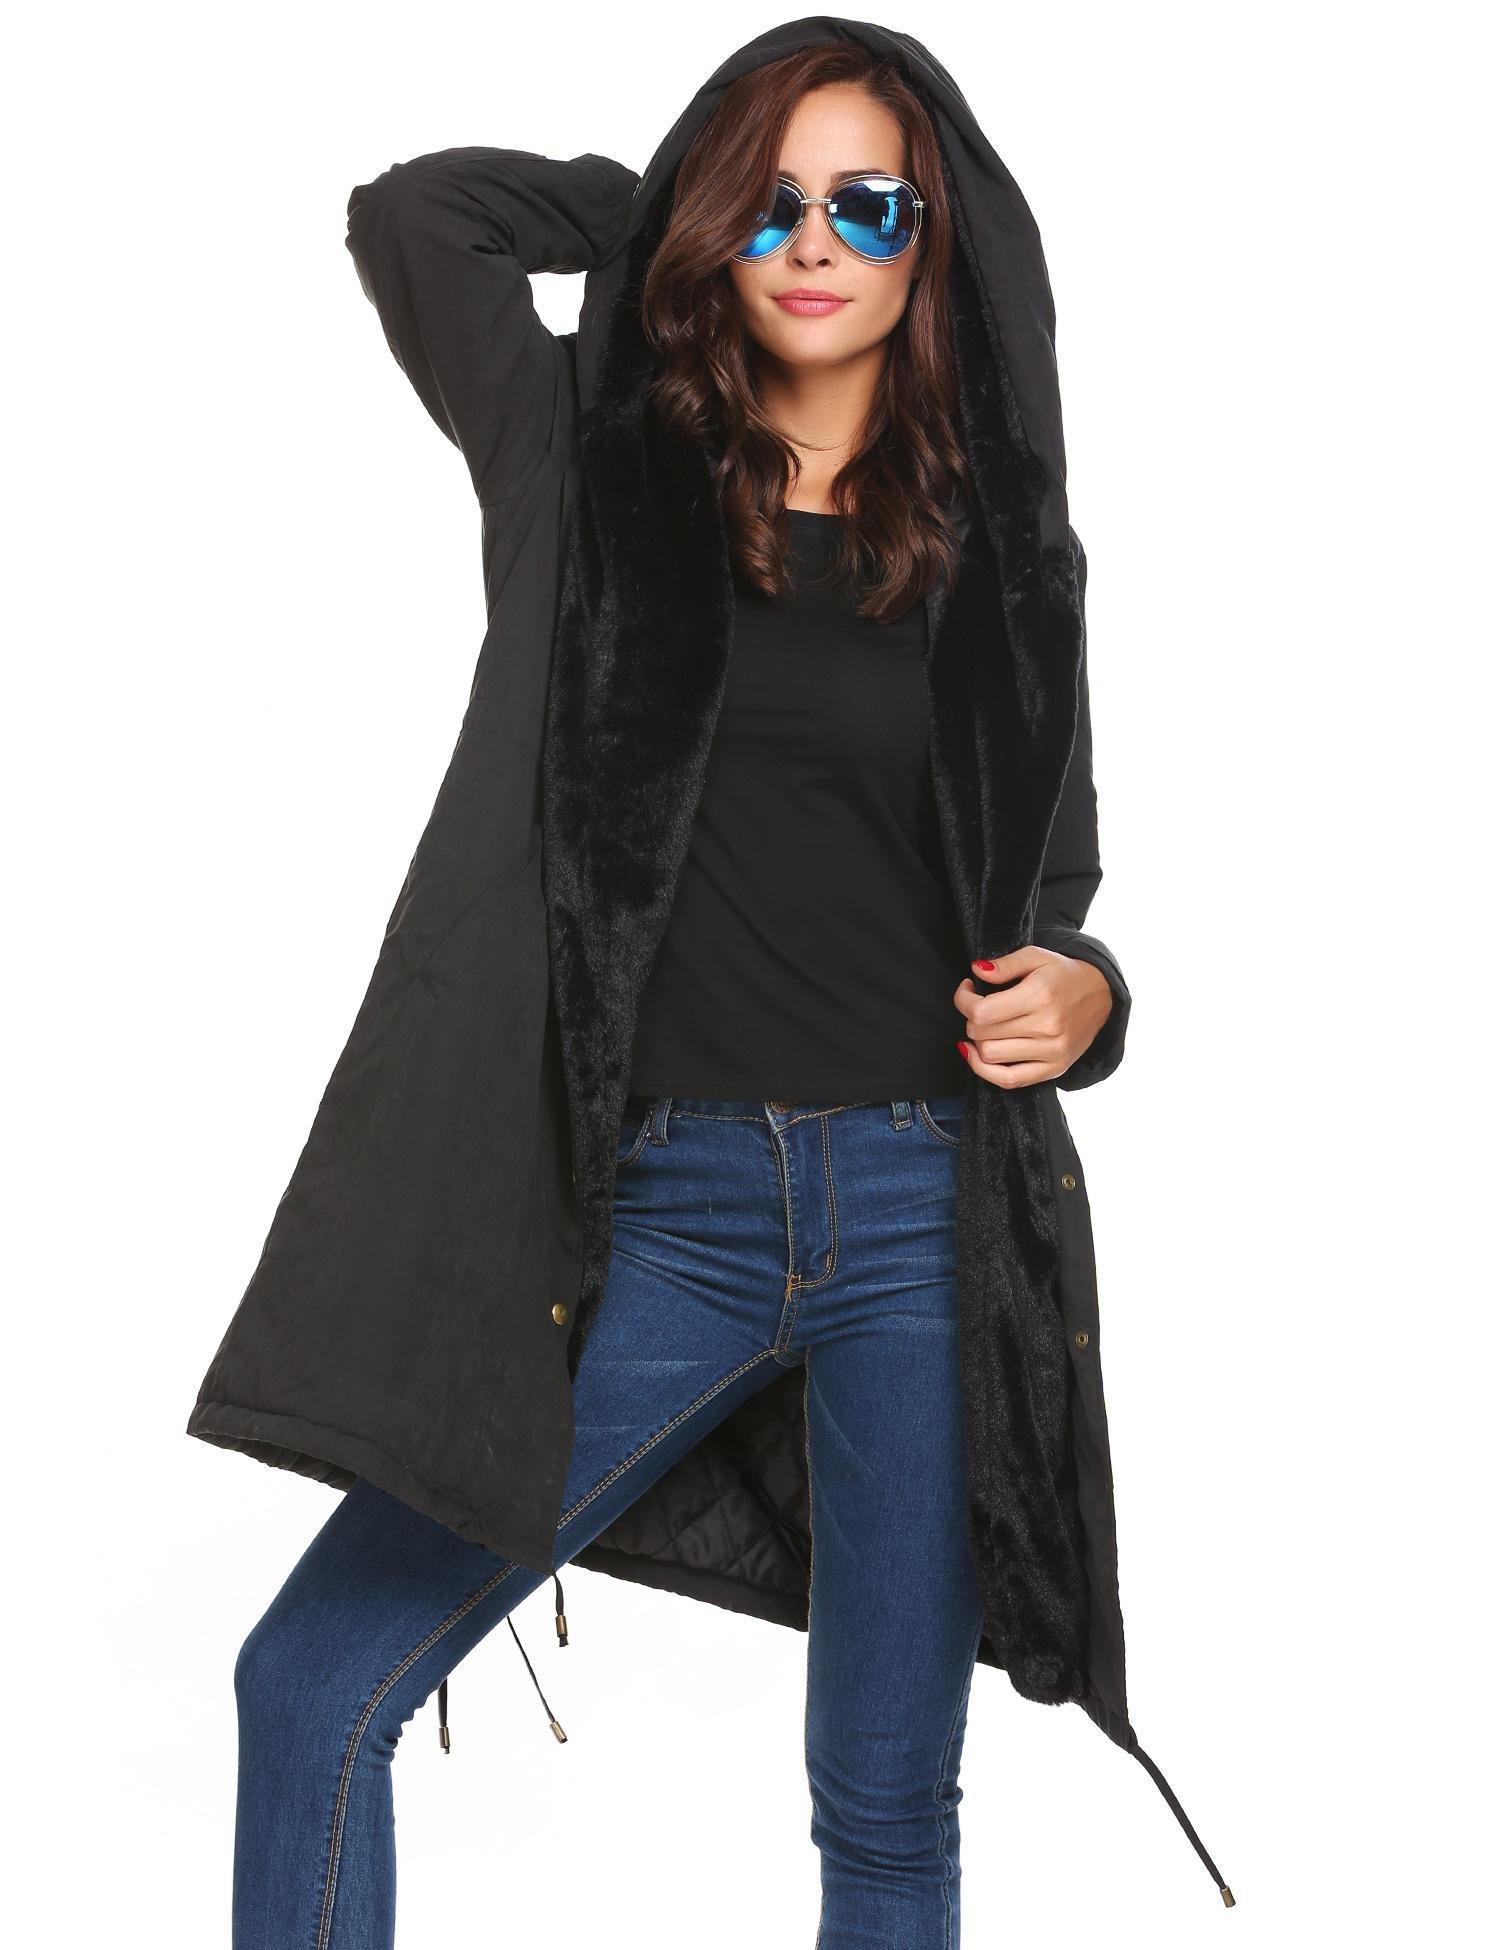 Zeagoo Womens Hooded Warm Coats Parkas with Fax Fur Winter Jacket (XXX-Large, Black)